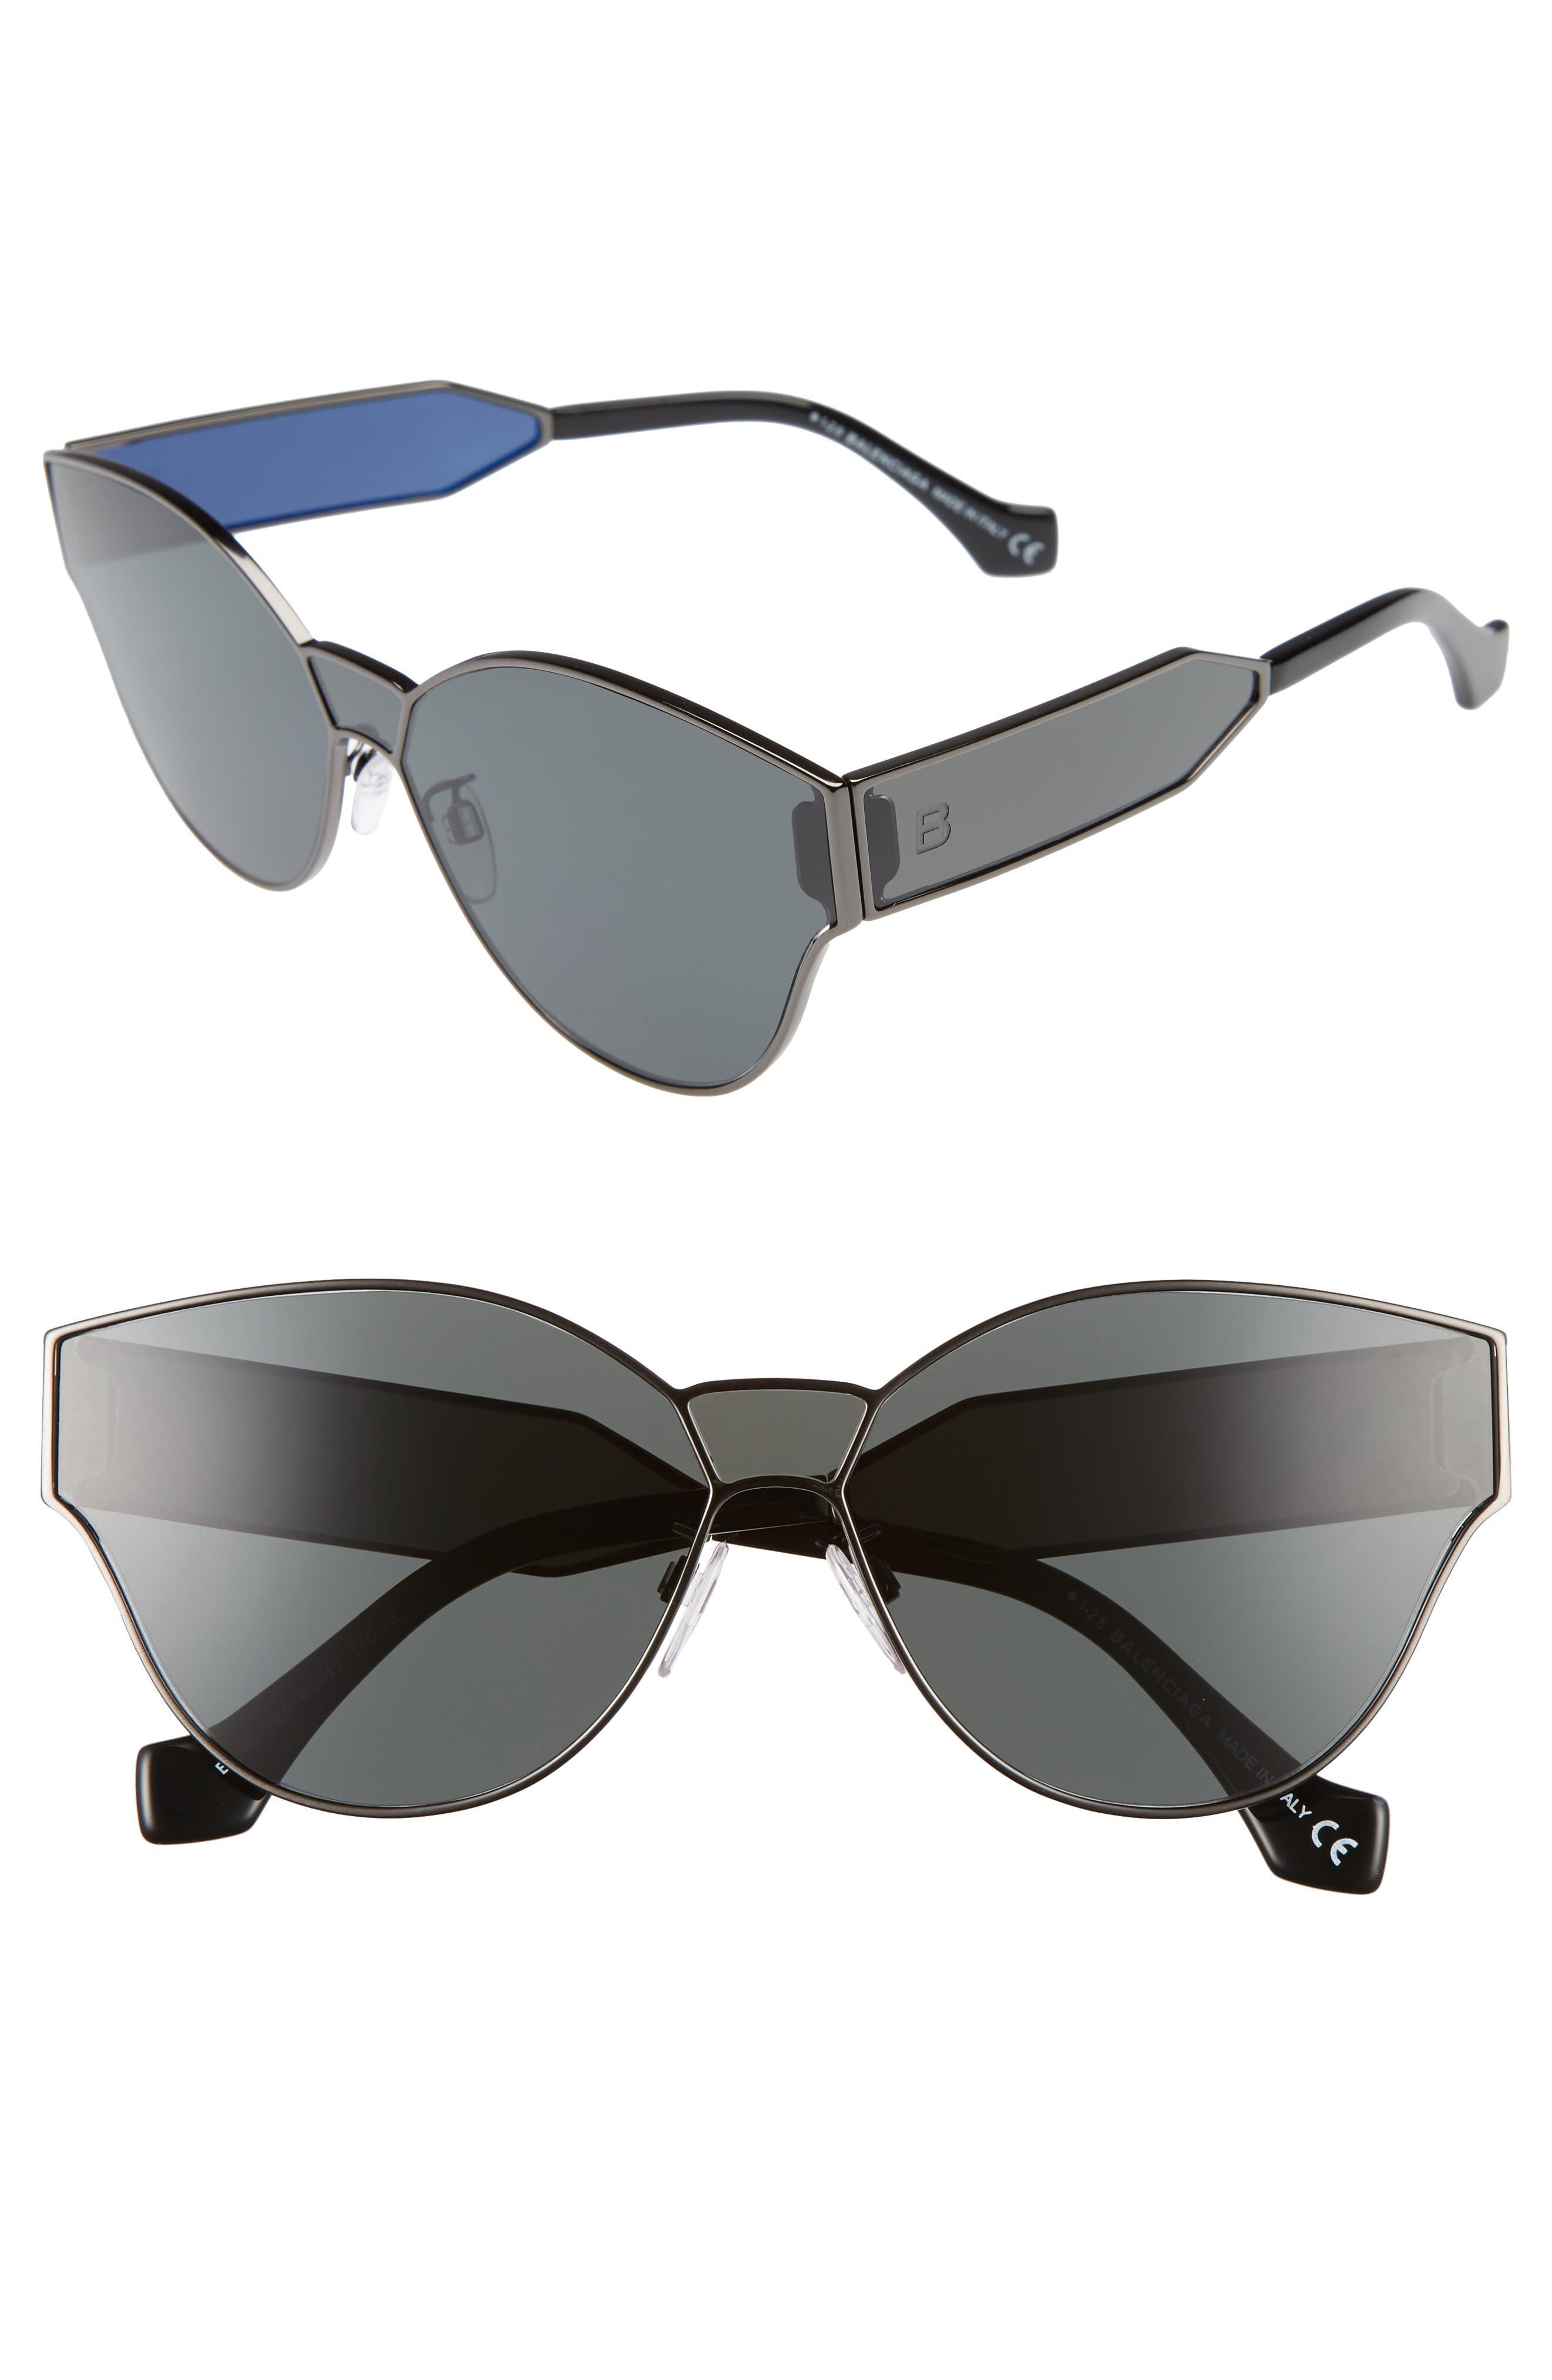 65mm Sunglasses,                             Alternate thumbnail 2, color,                             040